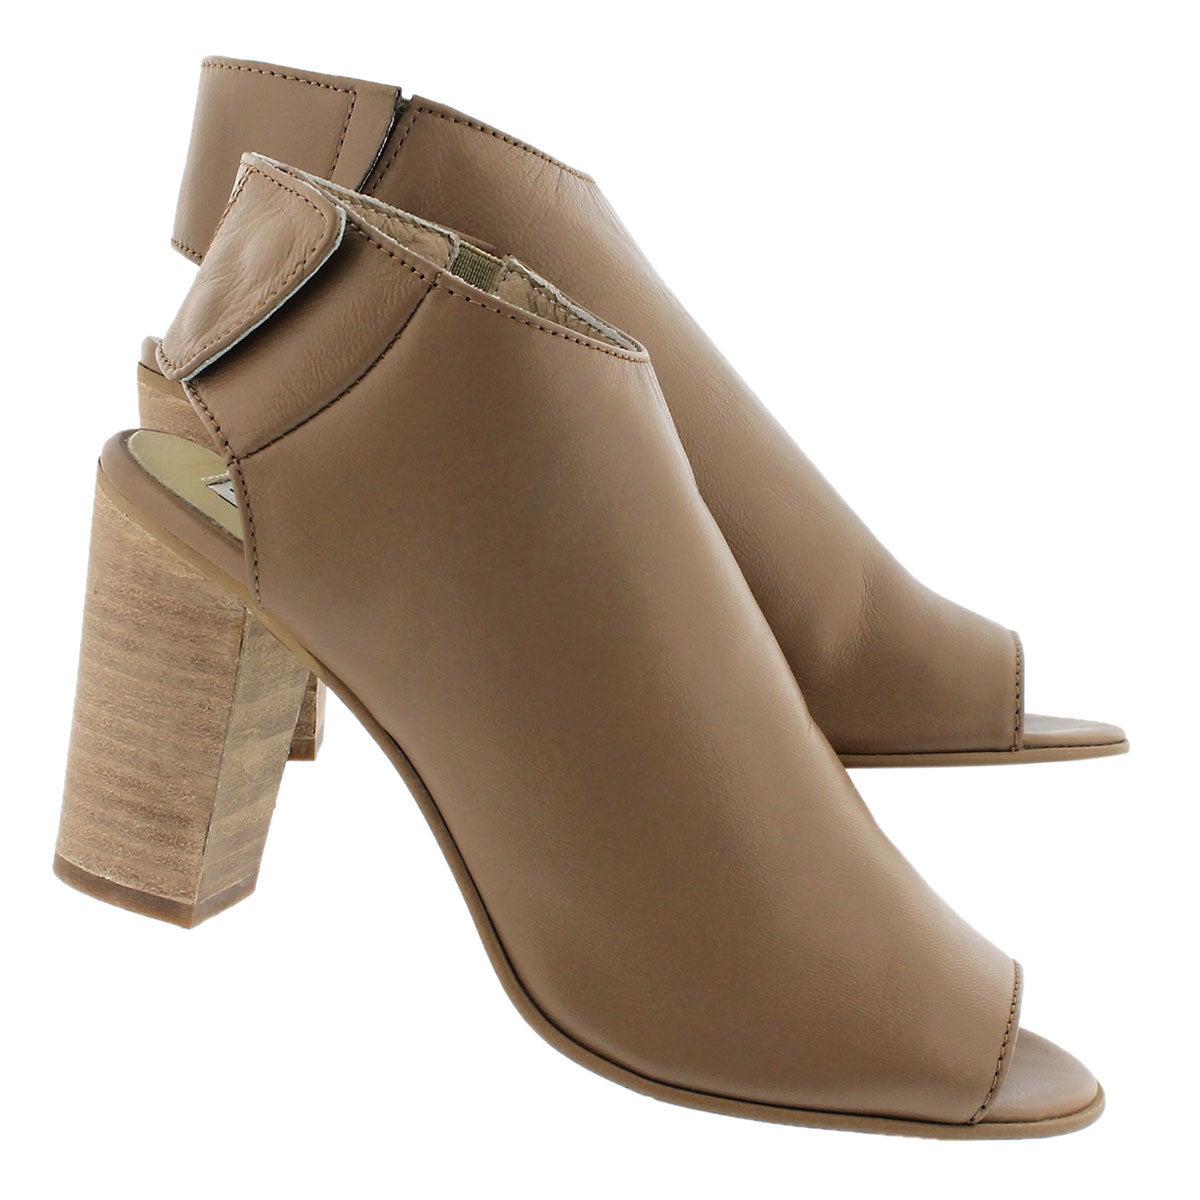 Lds Nonstop nat peep toe dress sandal